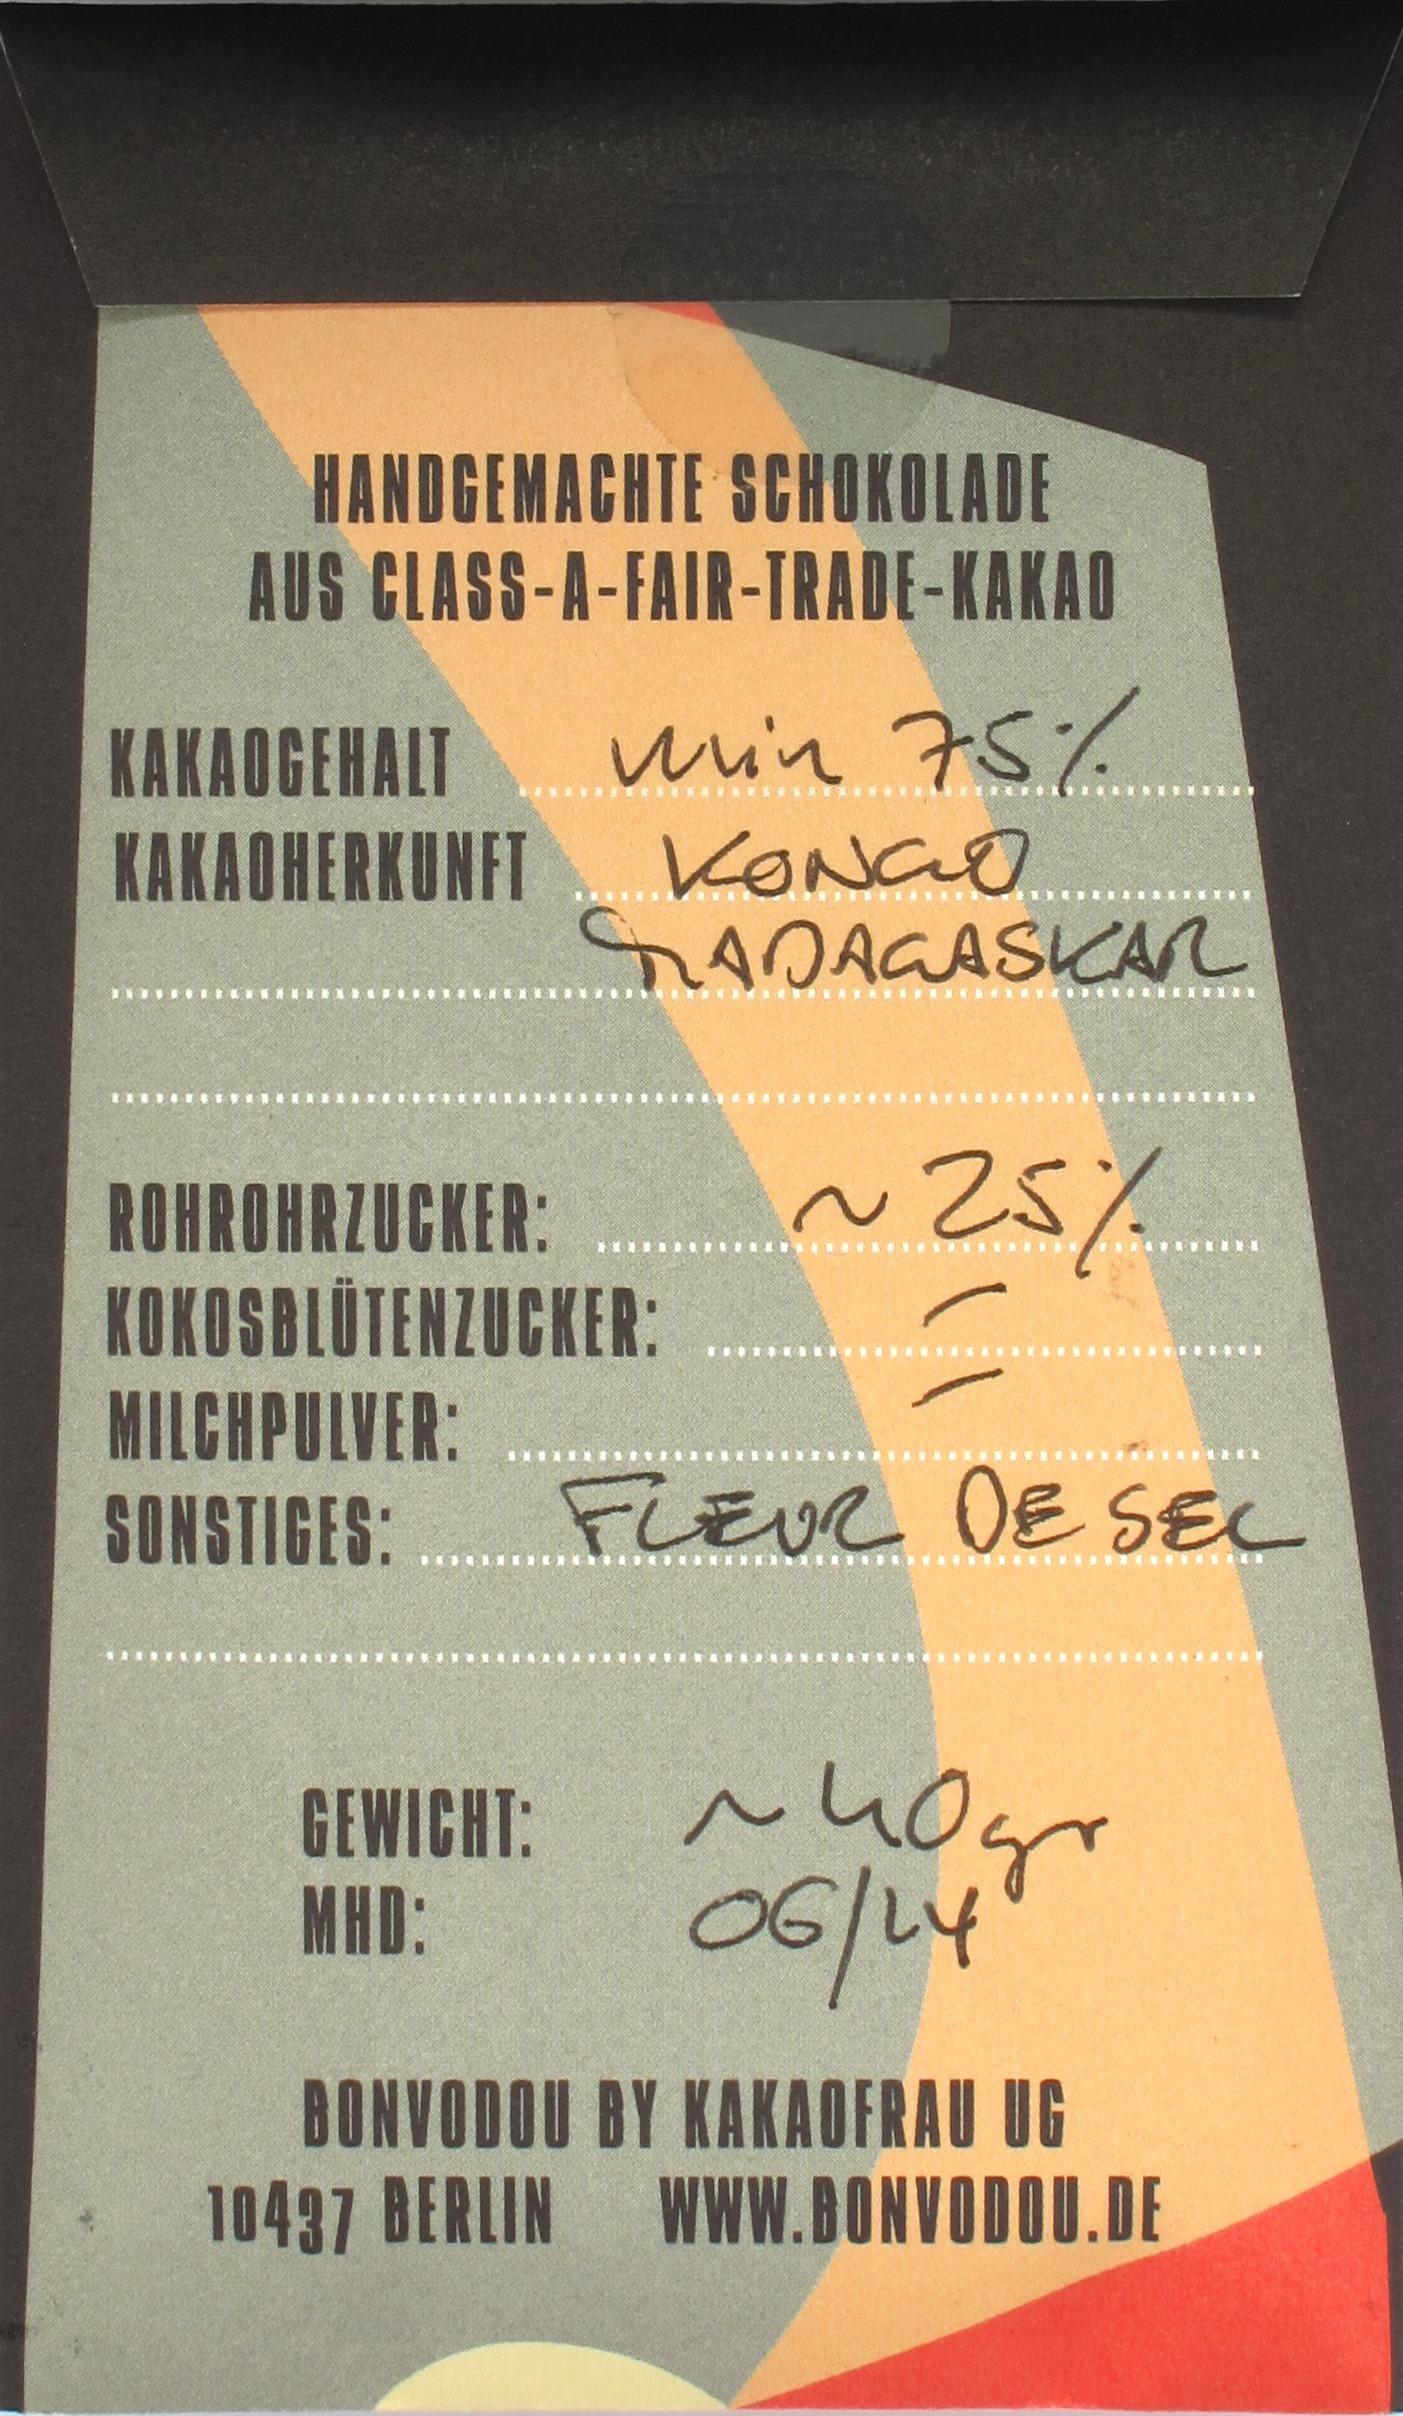 Bonvodou Salsplitter 75%, Rückseite